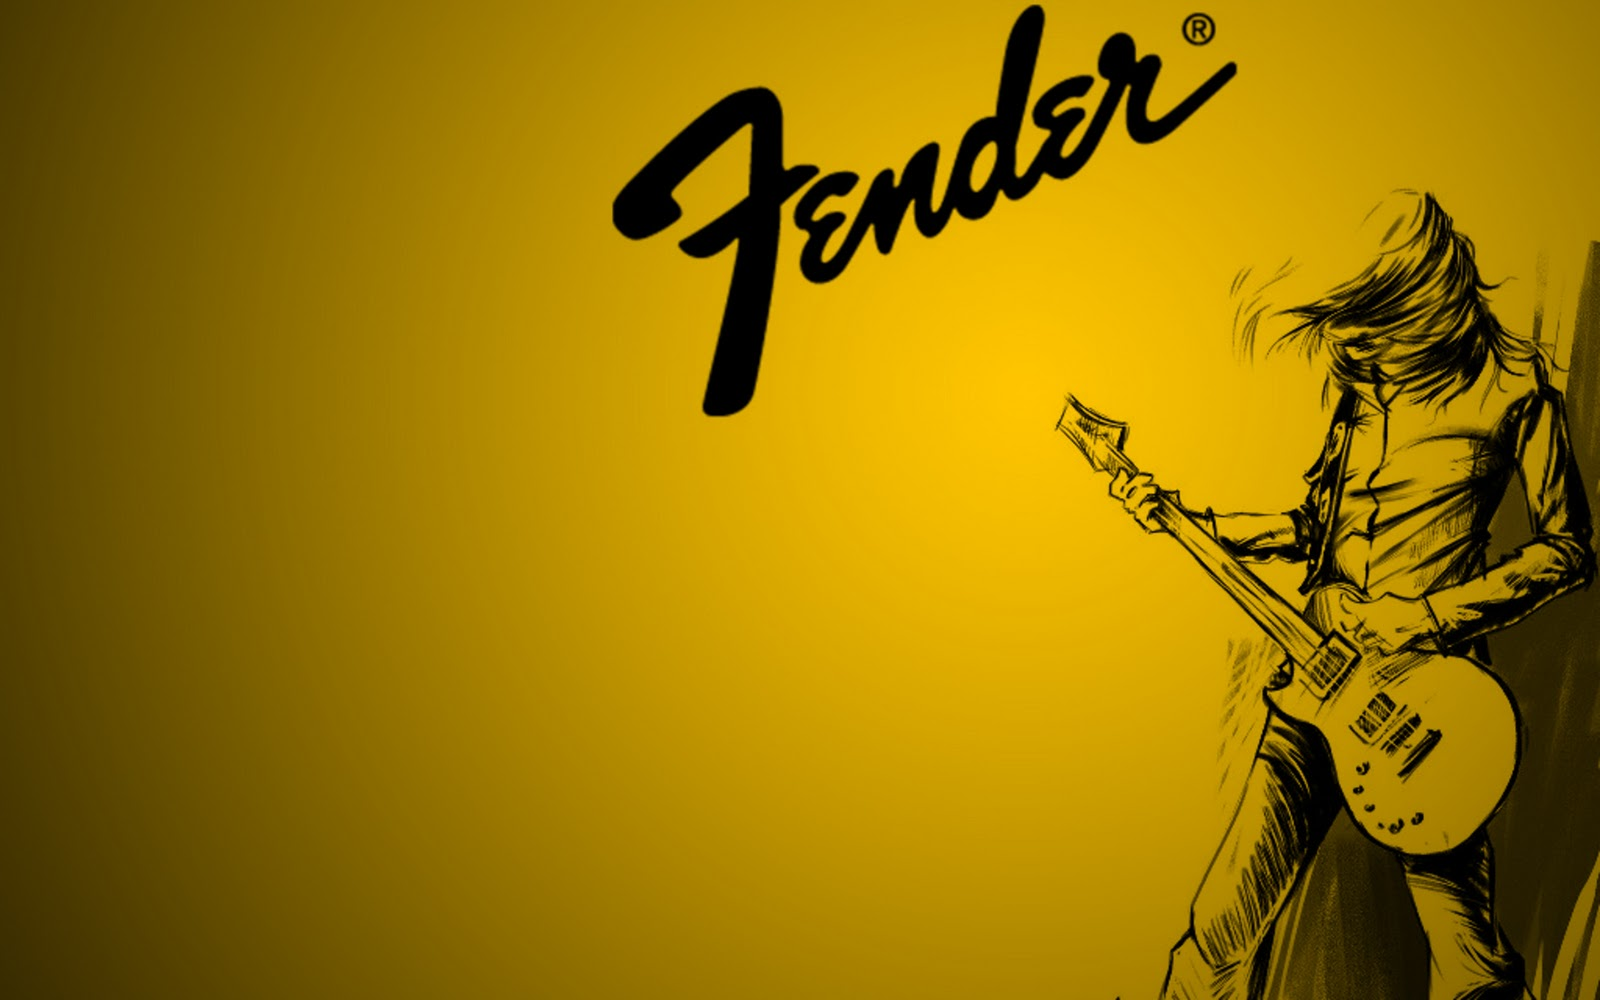 http://4.bp.blogspot.com/-VCHn62Cm-WI/TZMec7xDS5I/AAAAAAAAAdk/jM1ELkOv7Lk/s1600/Fender+Electric+Guitar+Playing+Sketch+Drawing+Black+and+Yellow+Stratocaster+Nice+Music+Desktop+HD+Wallpaper+2560x1600+by+kerem+Great+Guitar+Sound+www.GreatGuitarSound.Blogspot.com.jpg